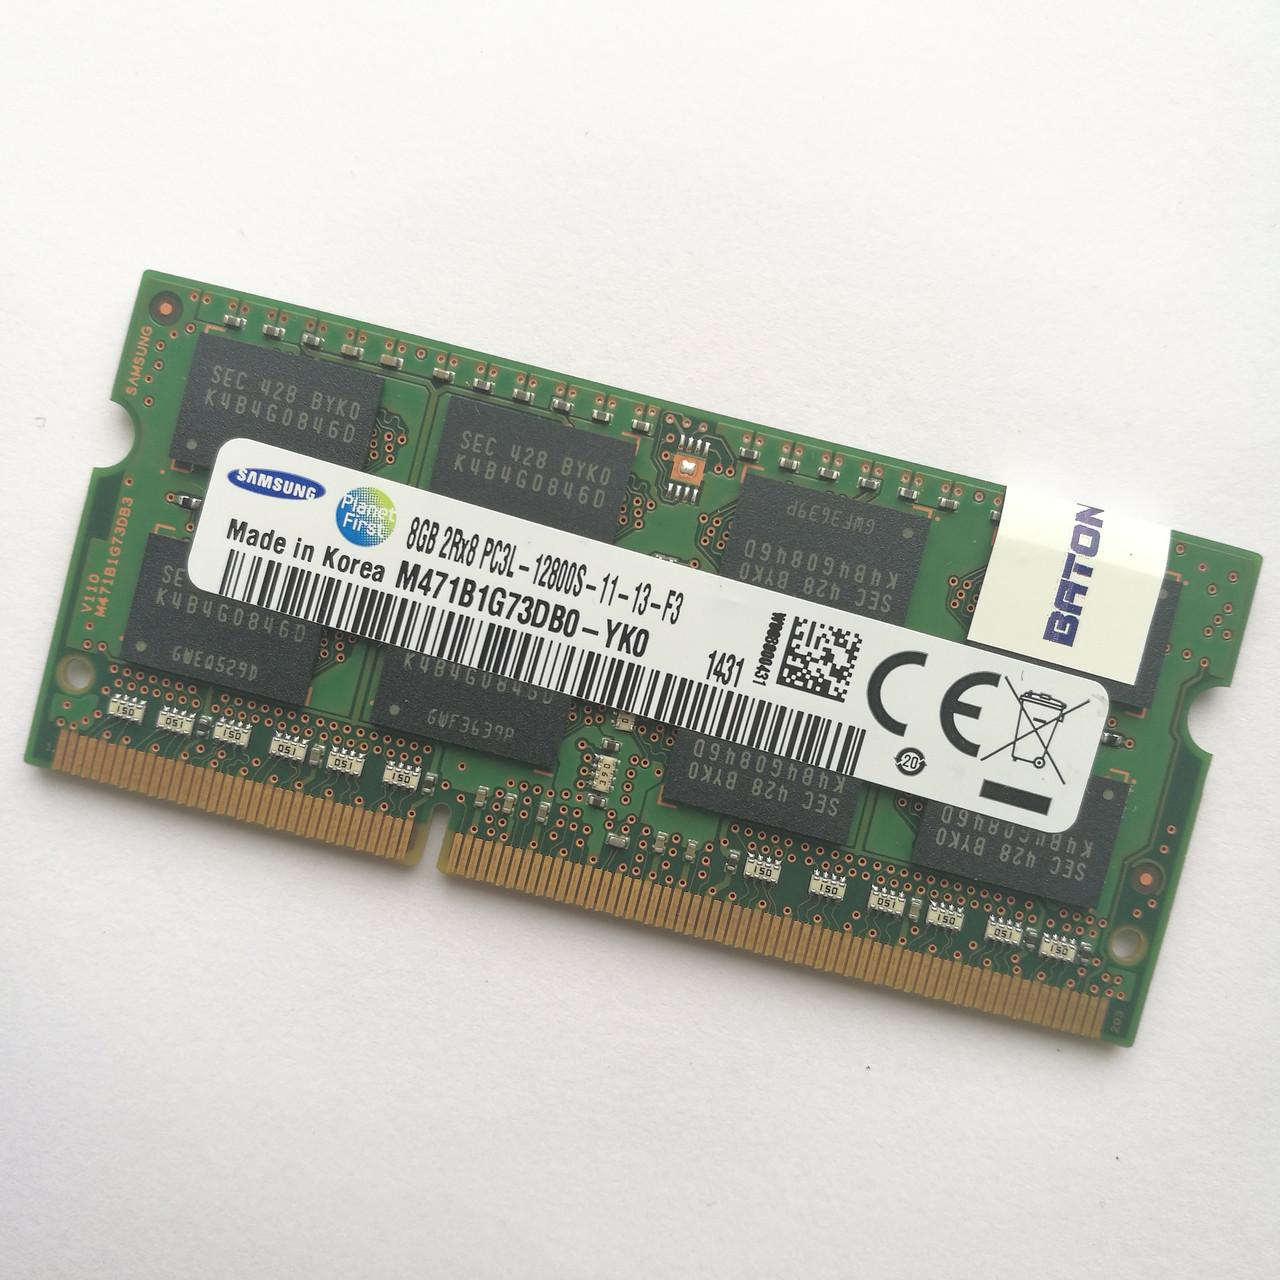 Оперативная память для ноутбука Samsung SODIMM DDR3L 8Gb 1600MHz 12800S CL11 (M471B1G73DB0-YKO) Б/У